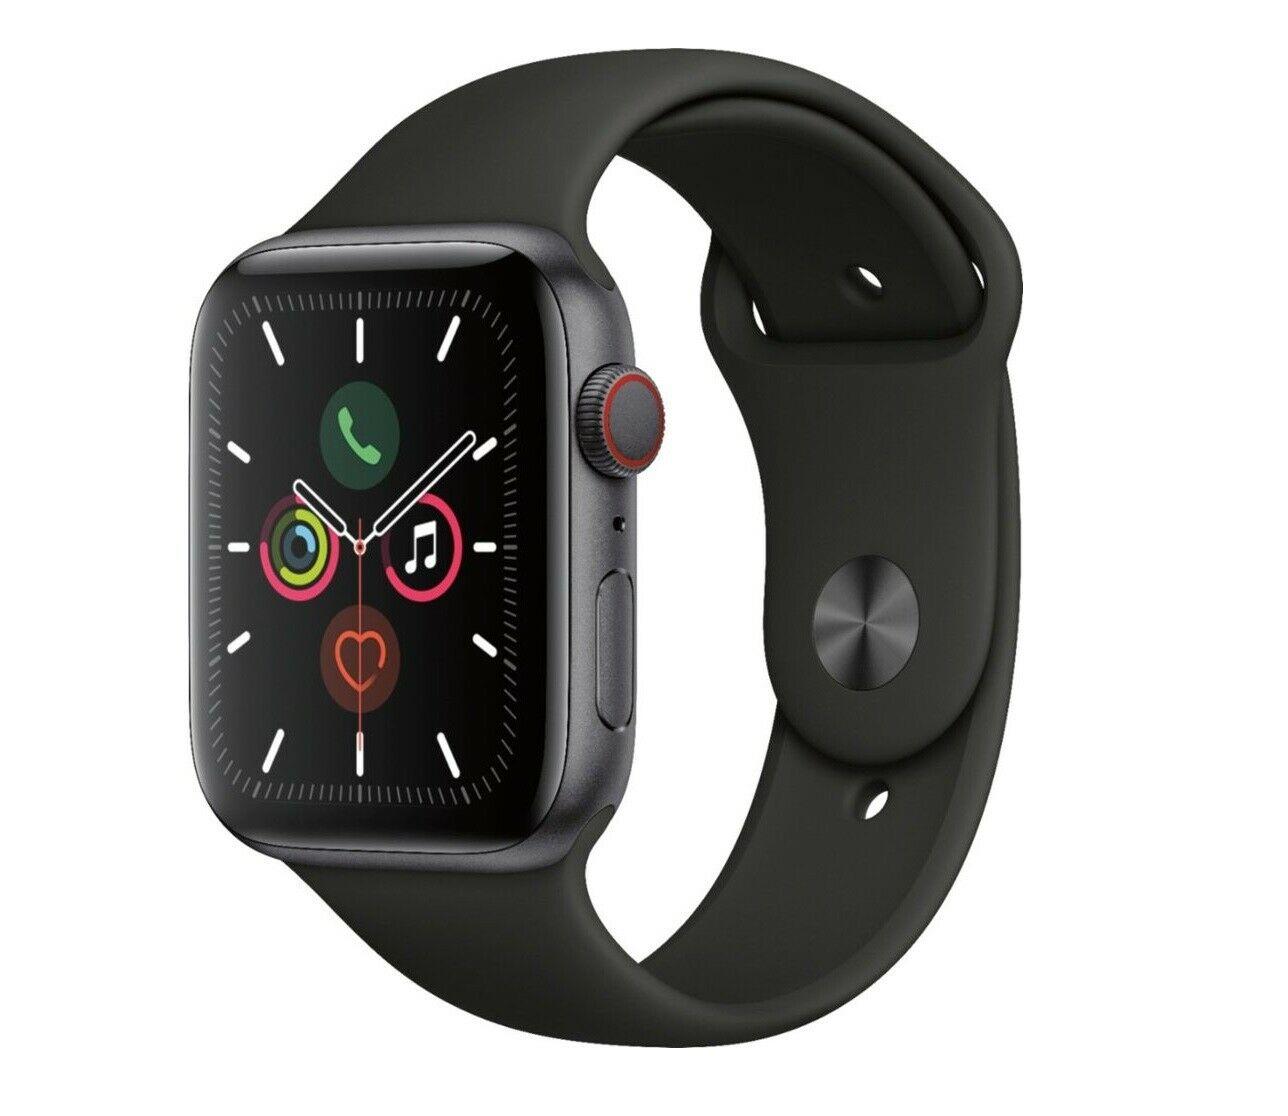 Apple Watch Series 5 44mm Lte Ebay Refurbished 373